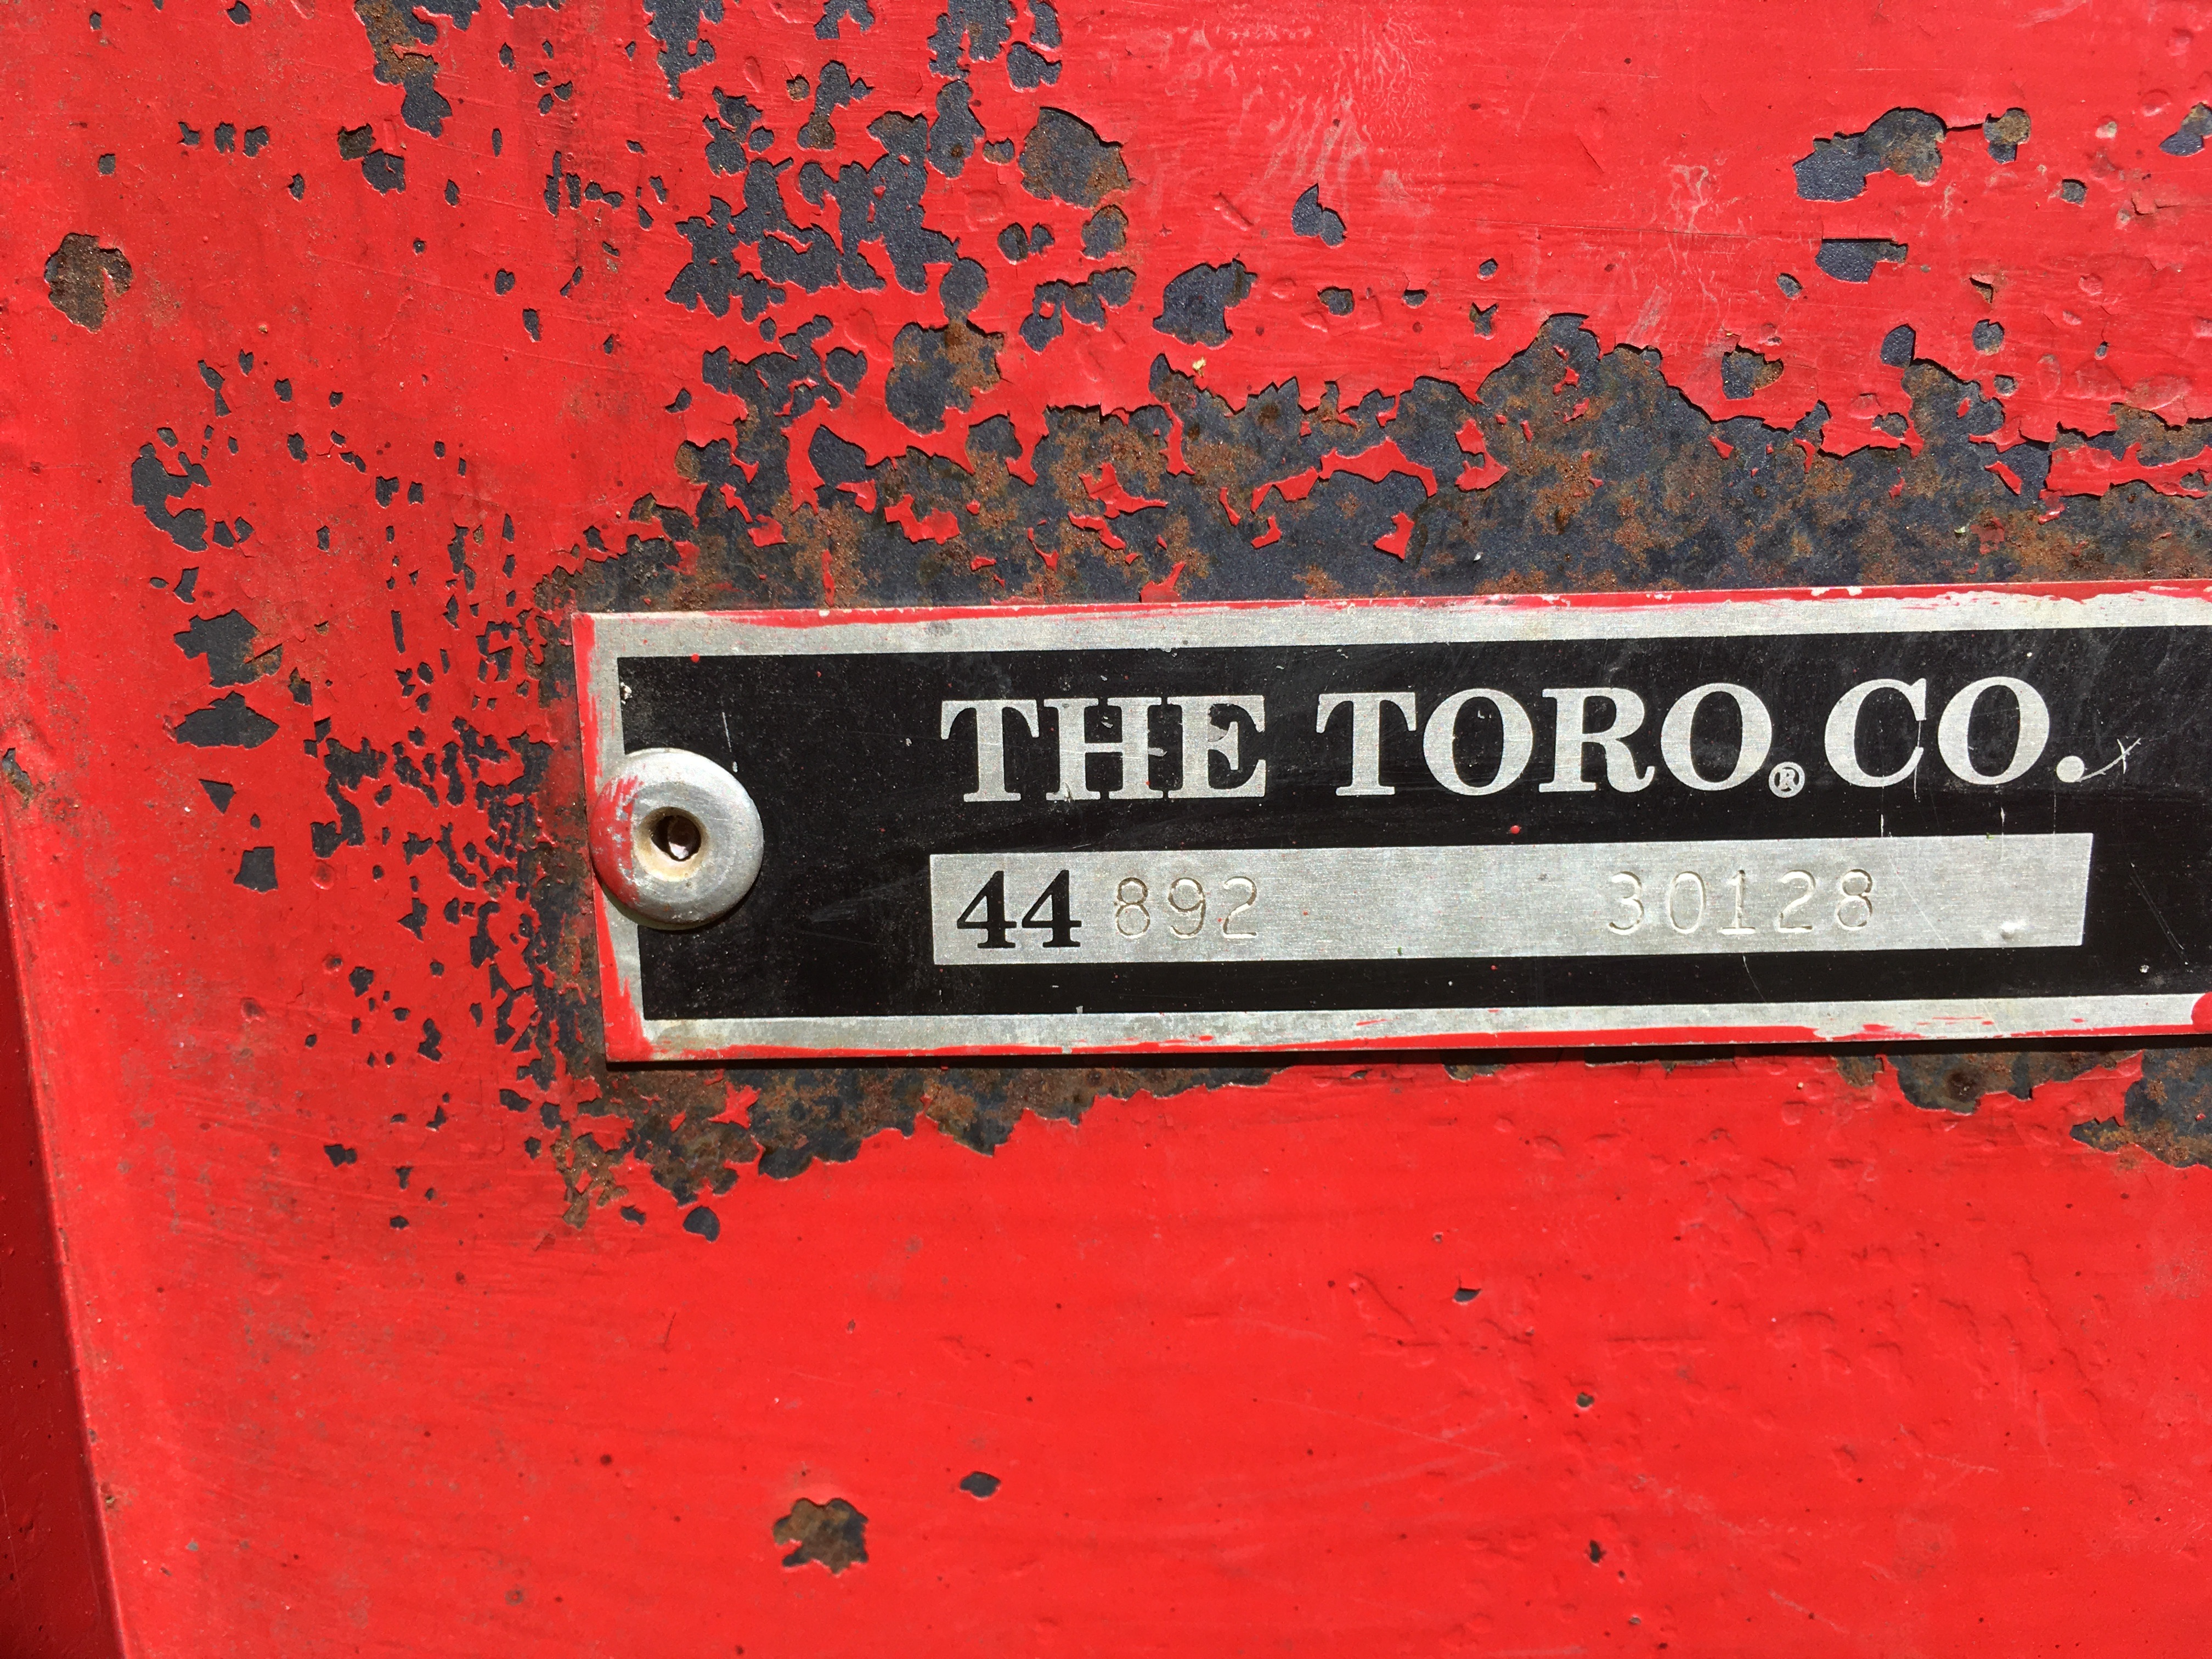 Toro-CoreBuster-03